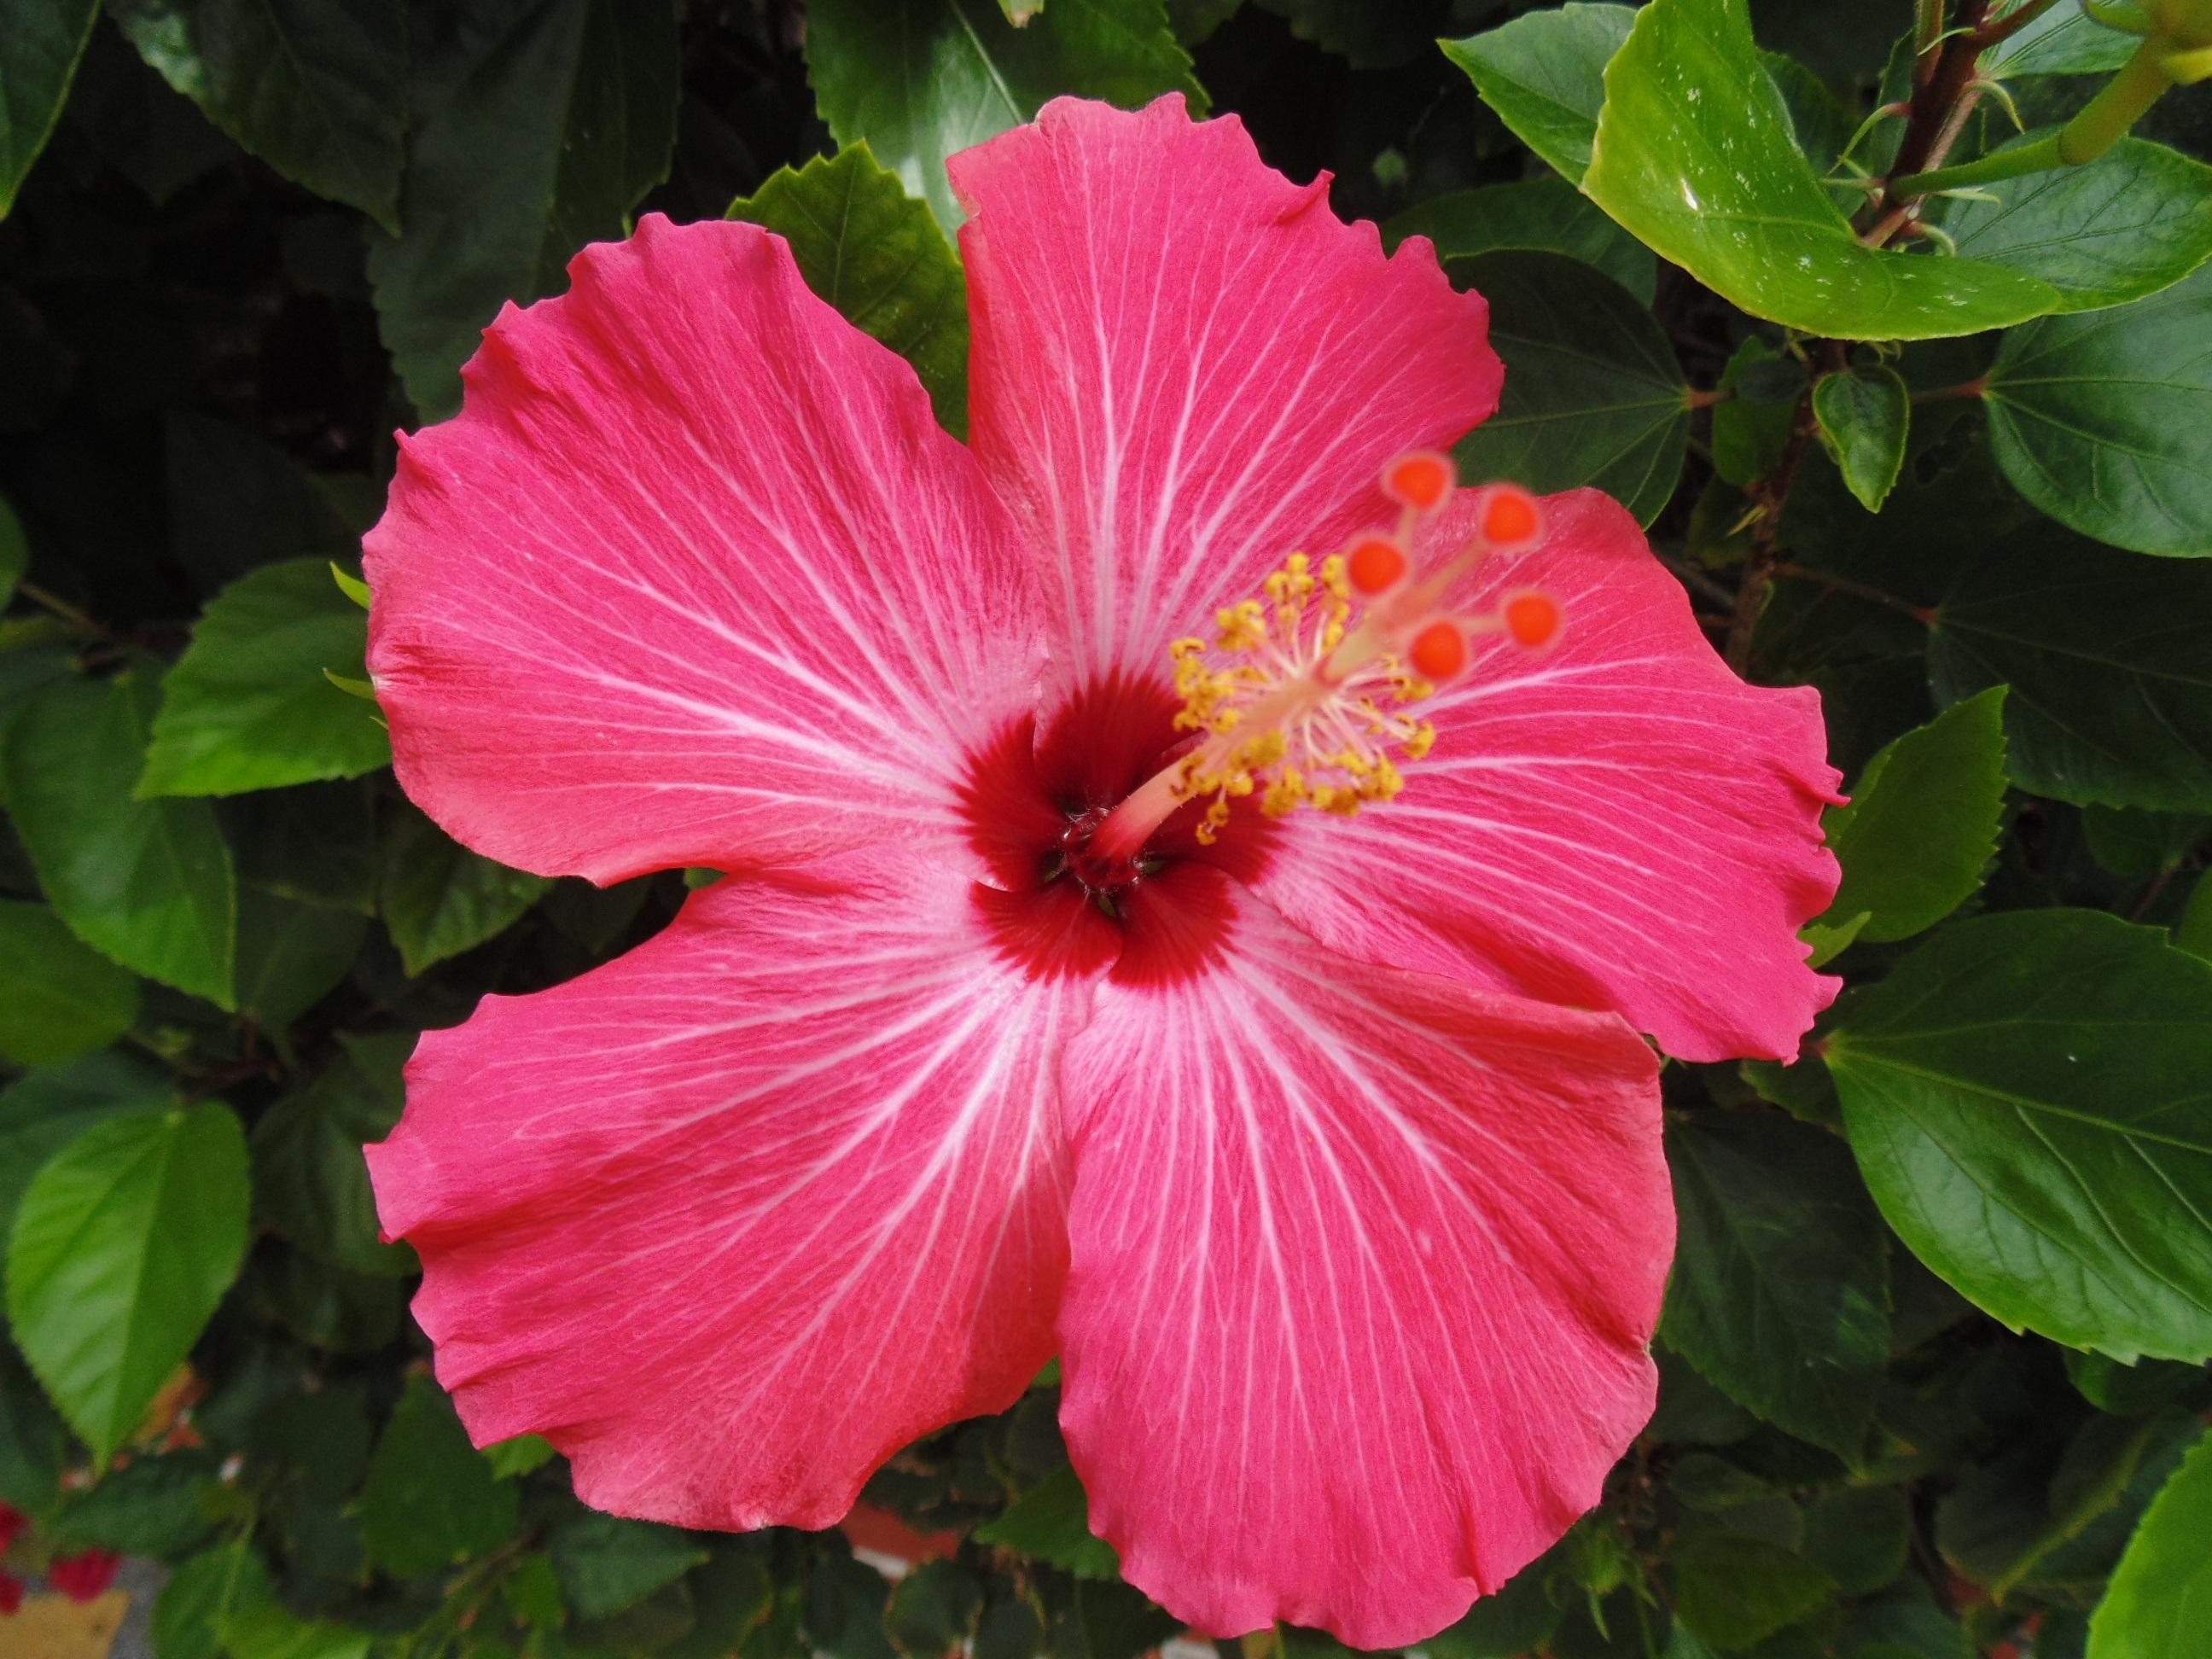 Free Images Nature Flower Petal Flora Shrub Malvales Pink